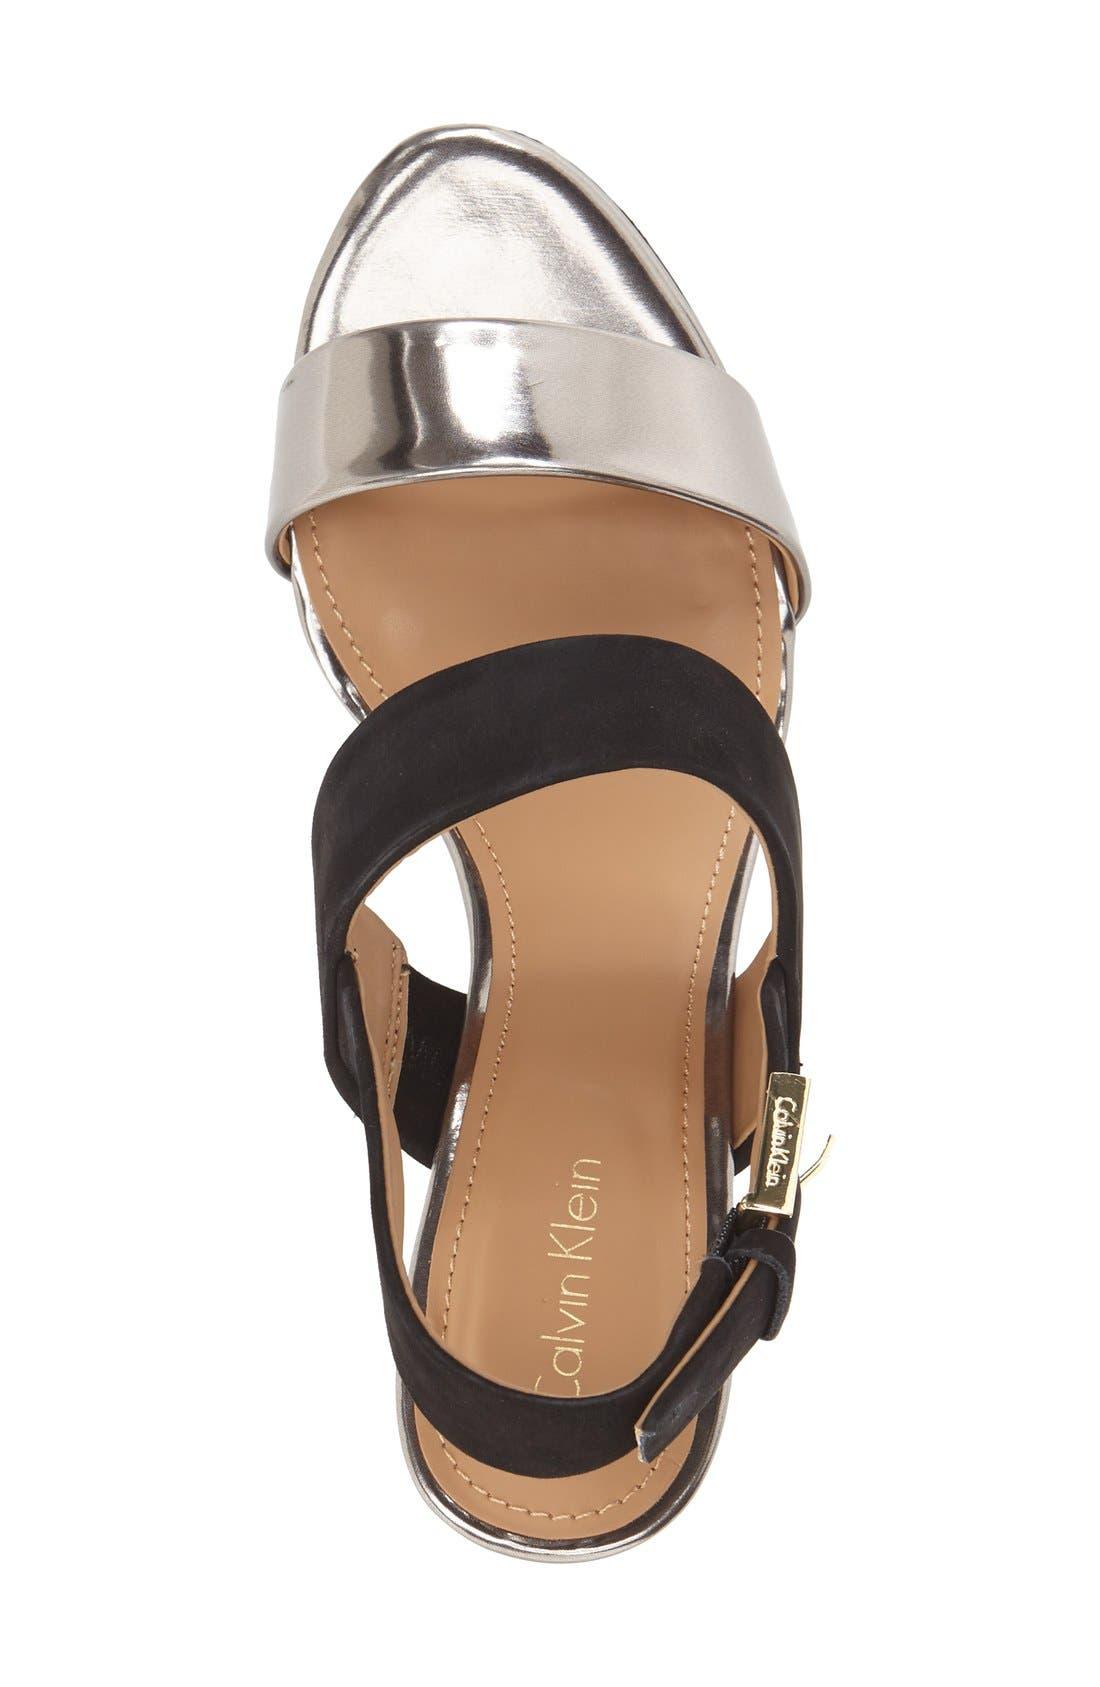 'Pearla' Wedge Sandal,                             Alternate thumbnail 2, color,                             001